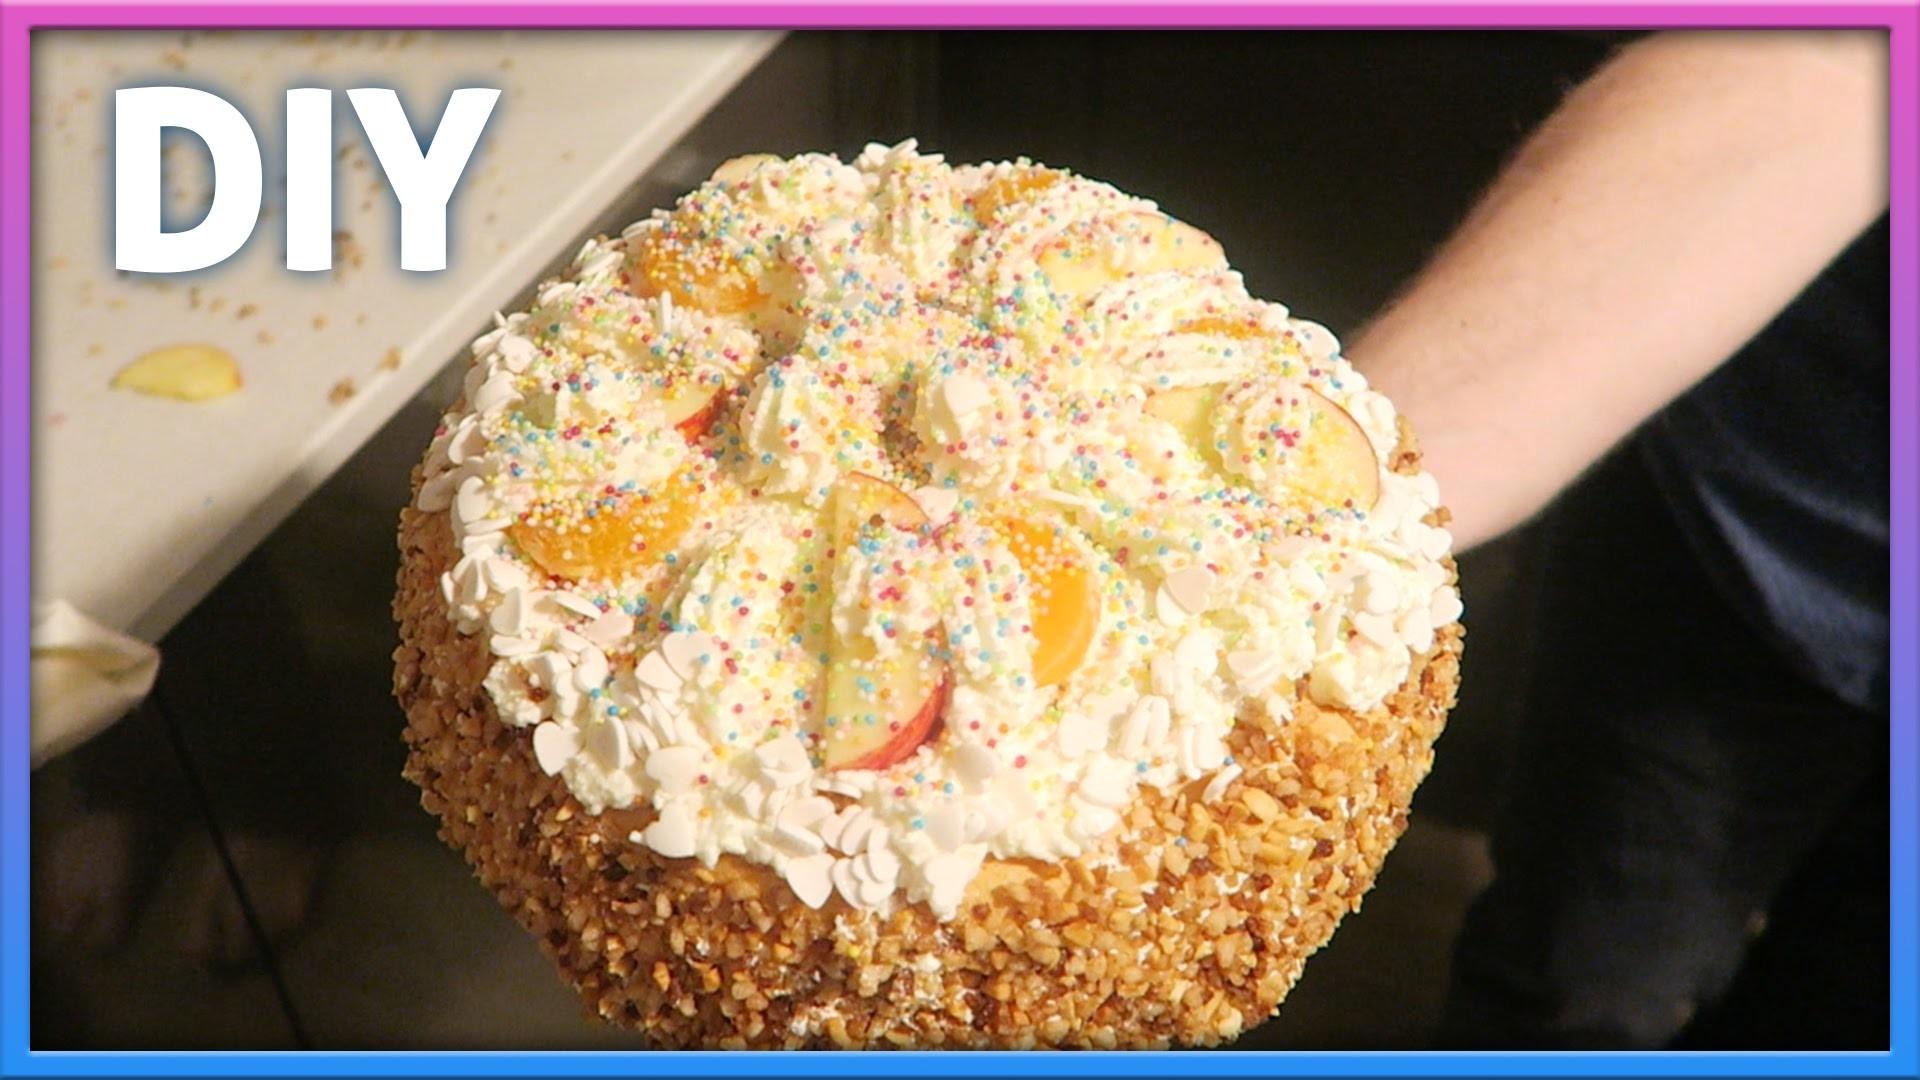 DIY - Gender Reveal cake maken!